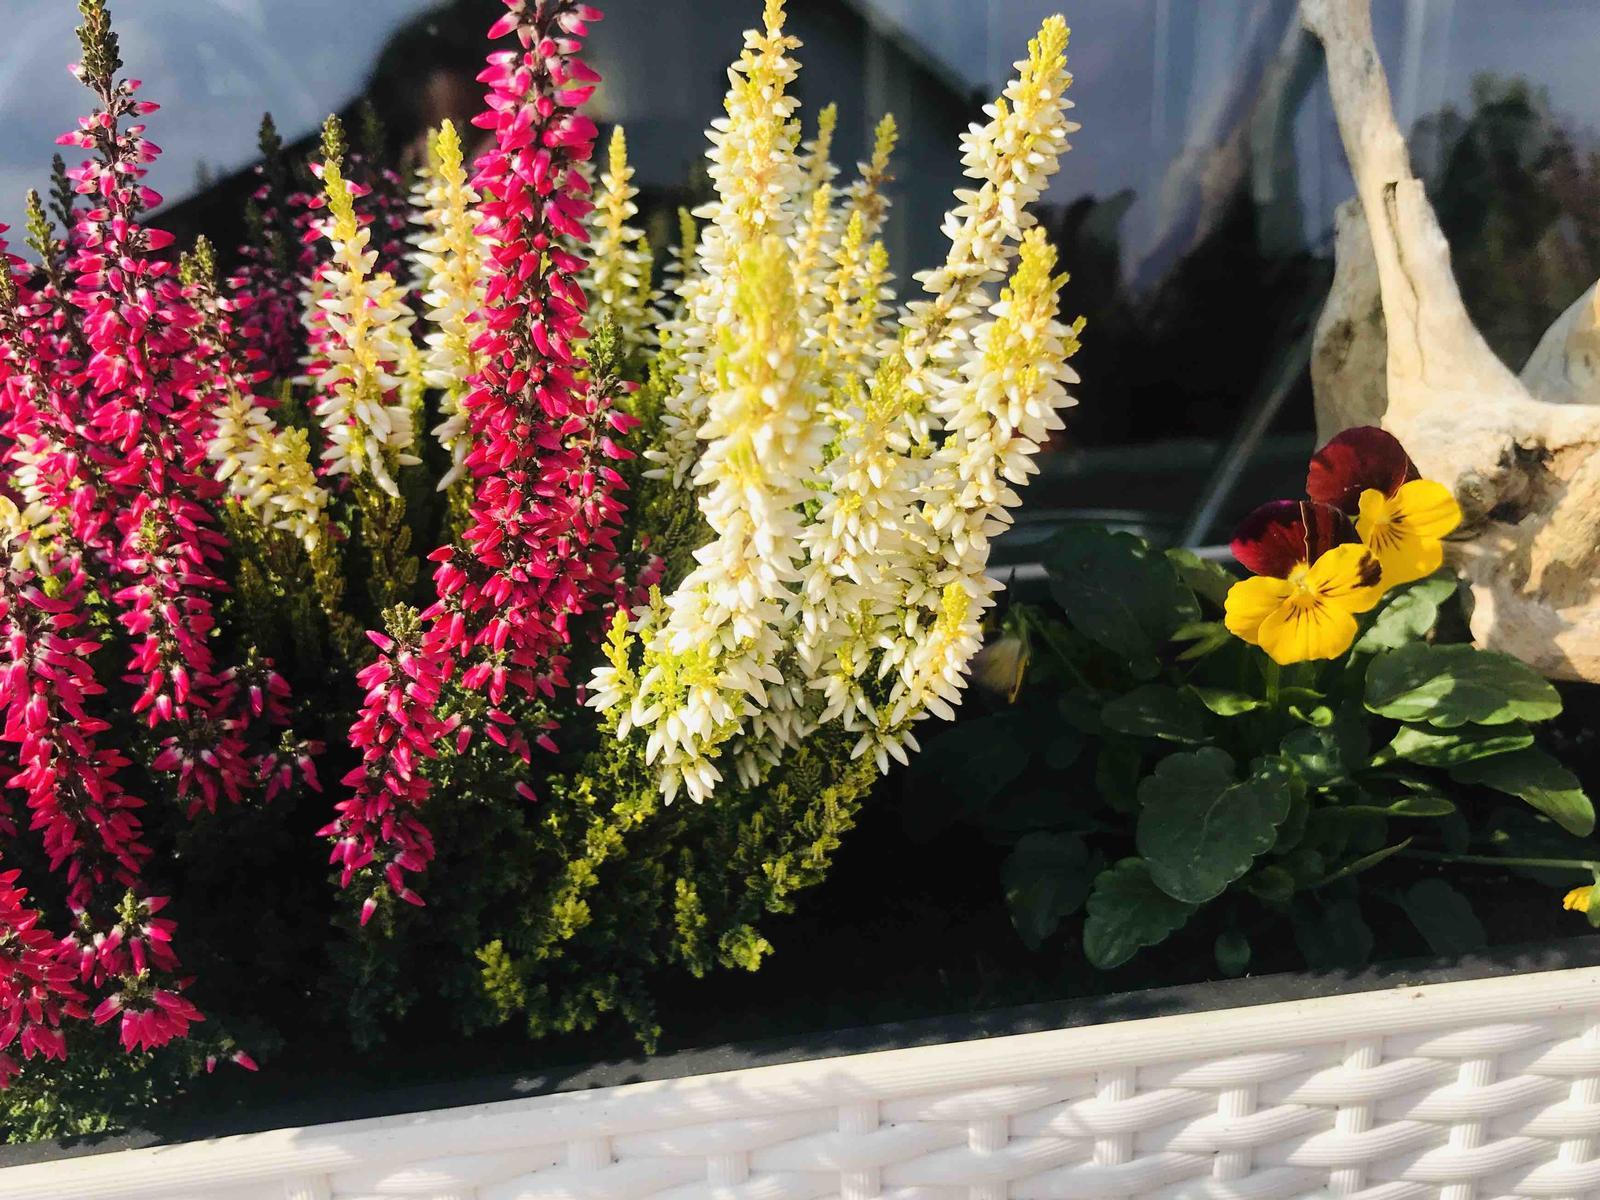 Naše barevná zahrada 🌸 - Obrázek č. 85